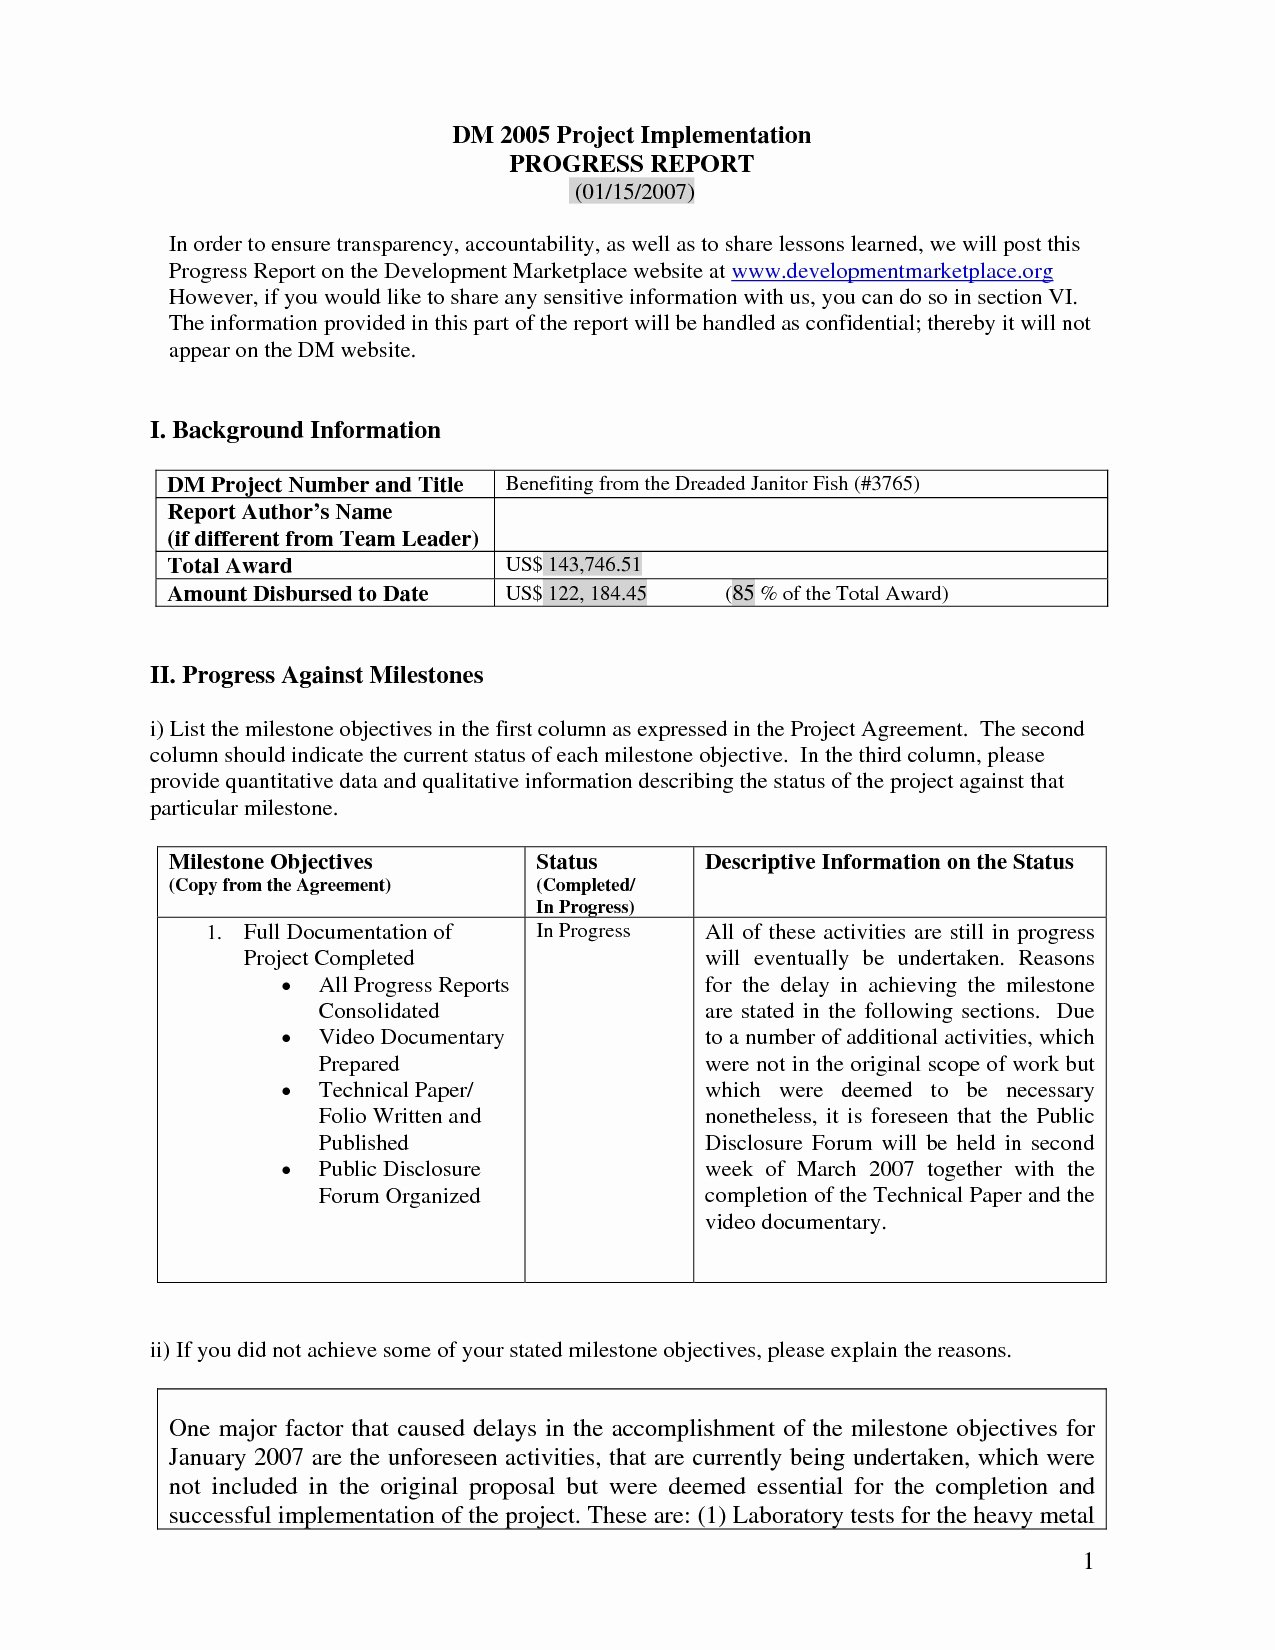 Janitor Job Description for Resume Resume Ideas